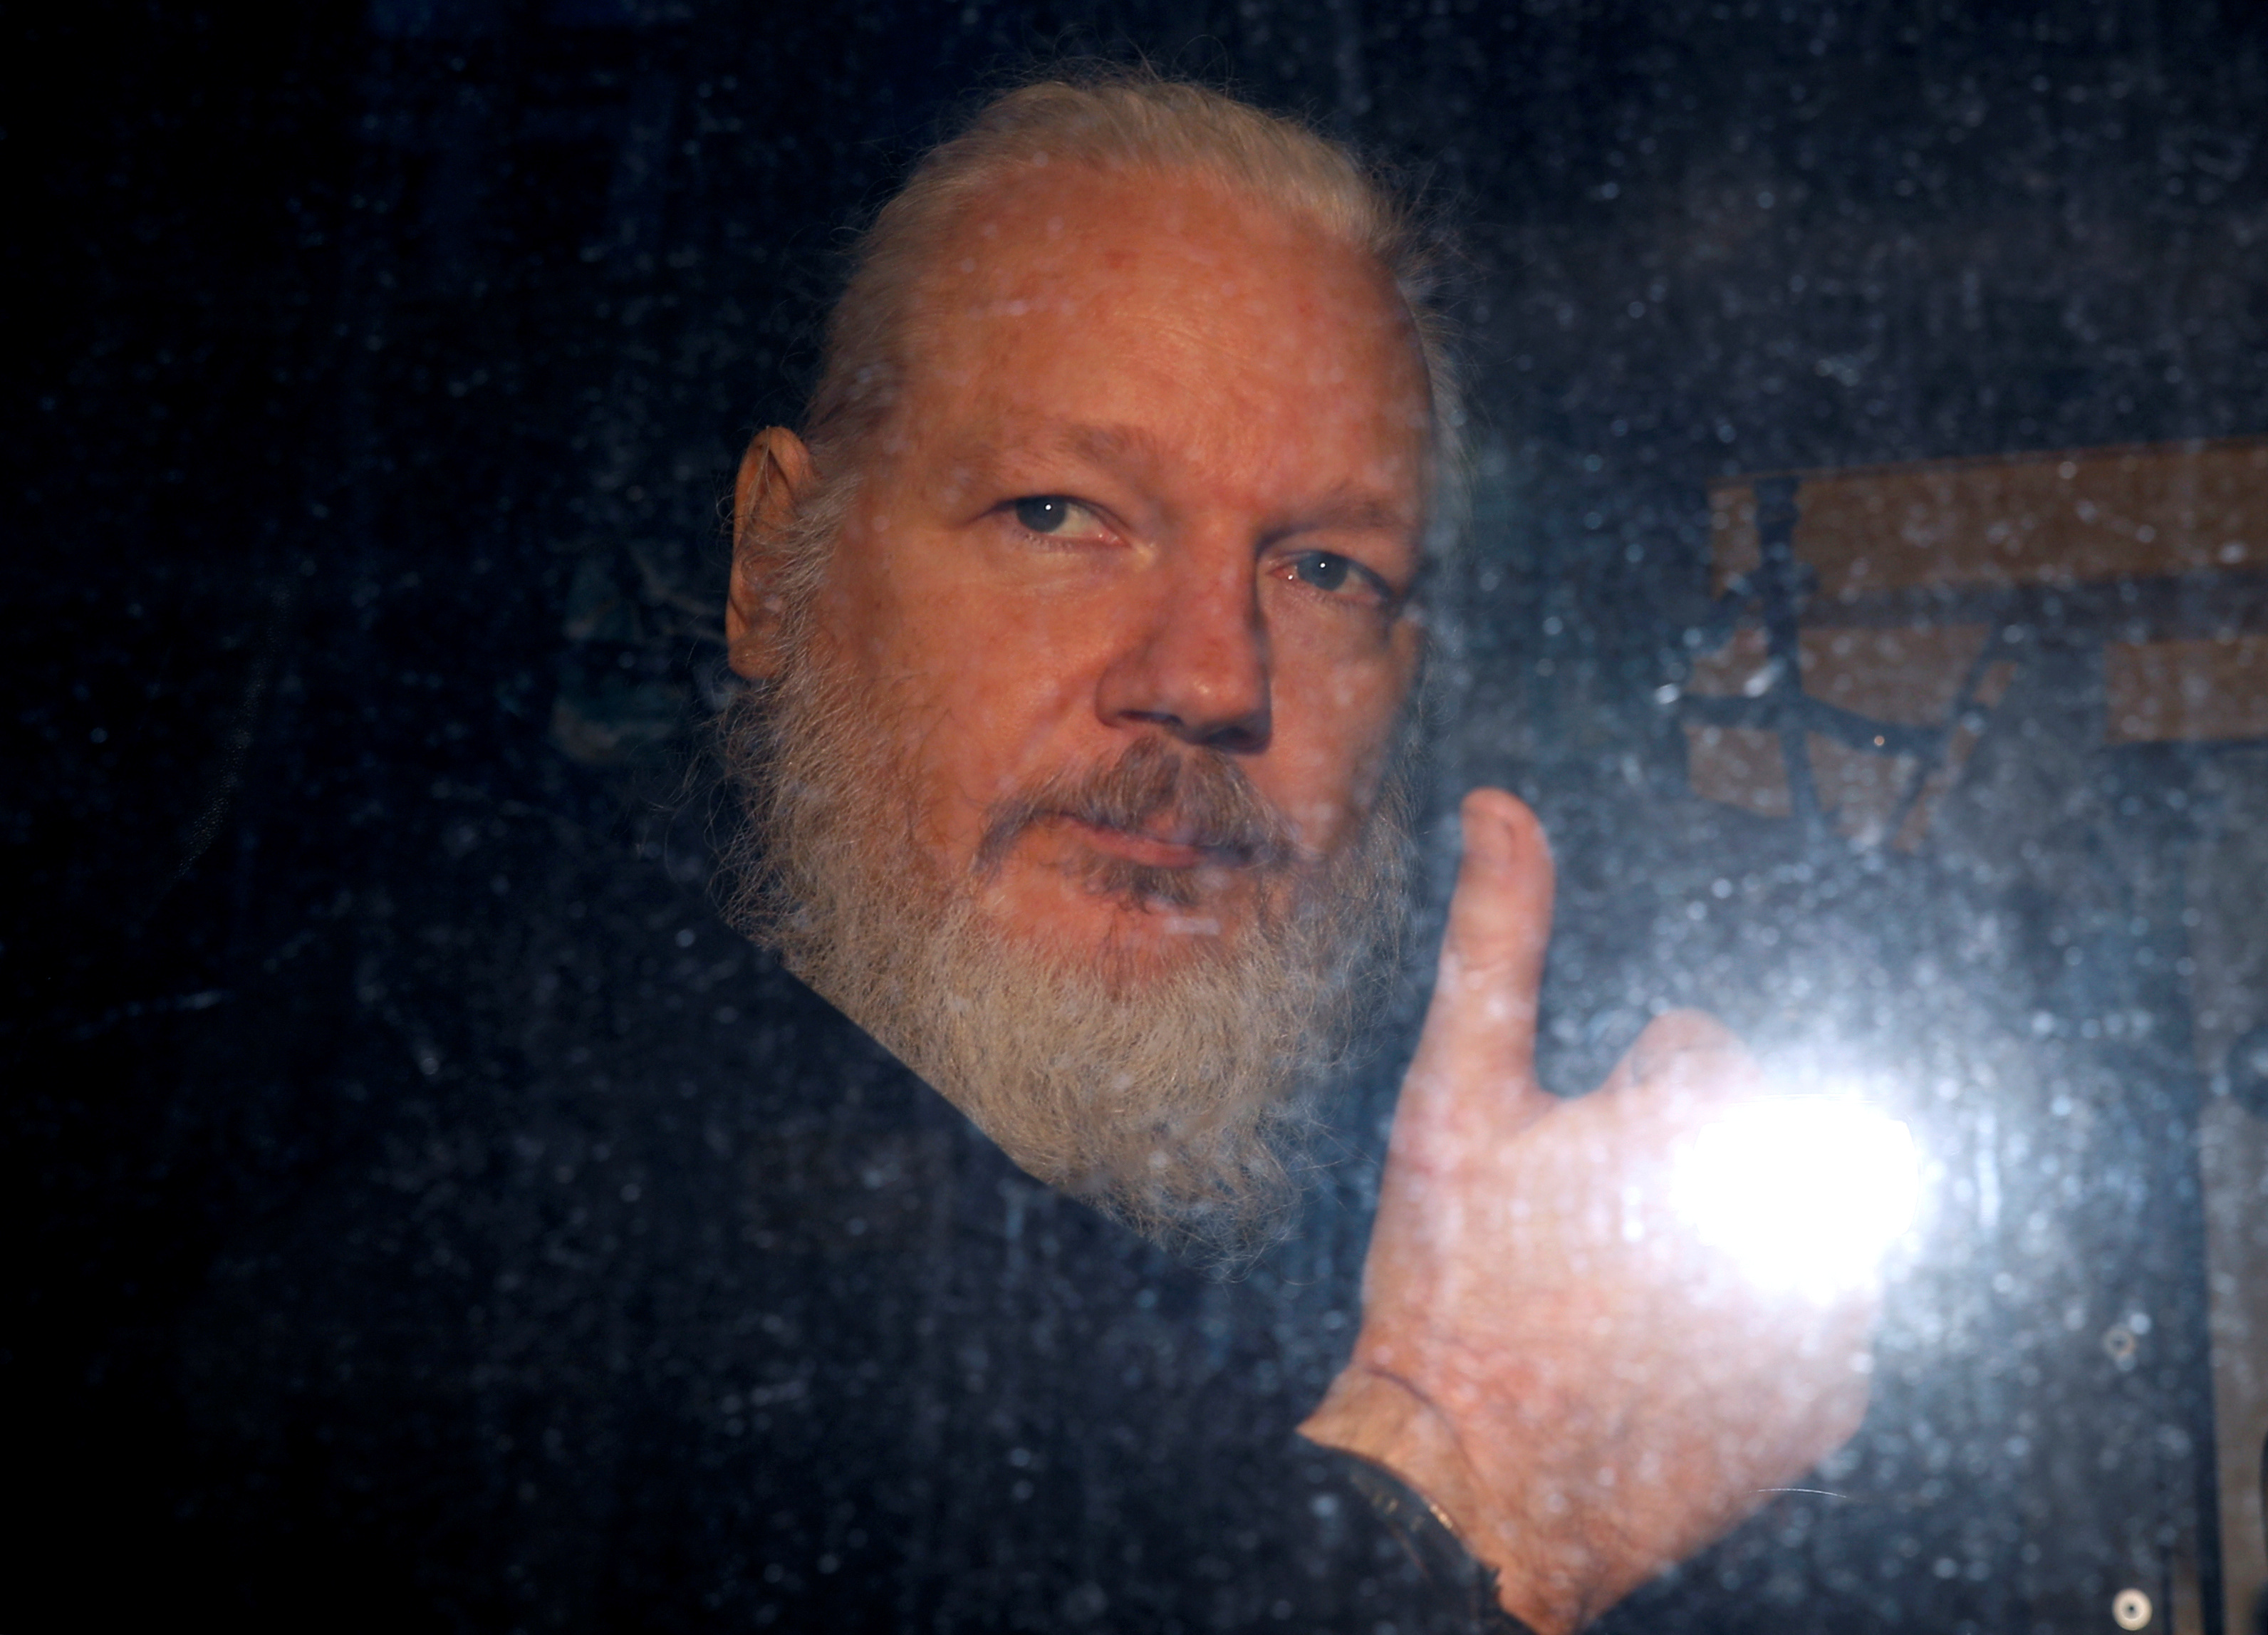 Swedish prosecutor issues formal request to hold Assange on rape suspicion